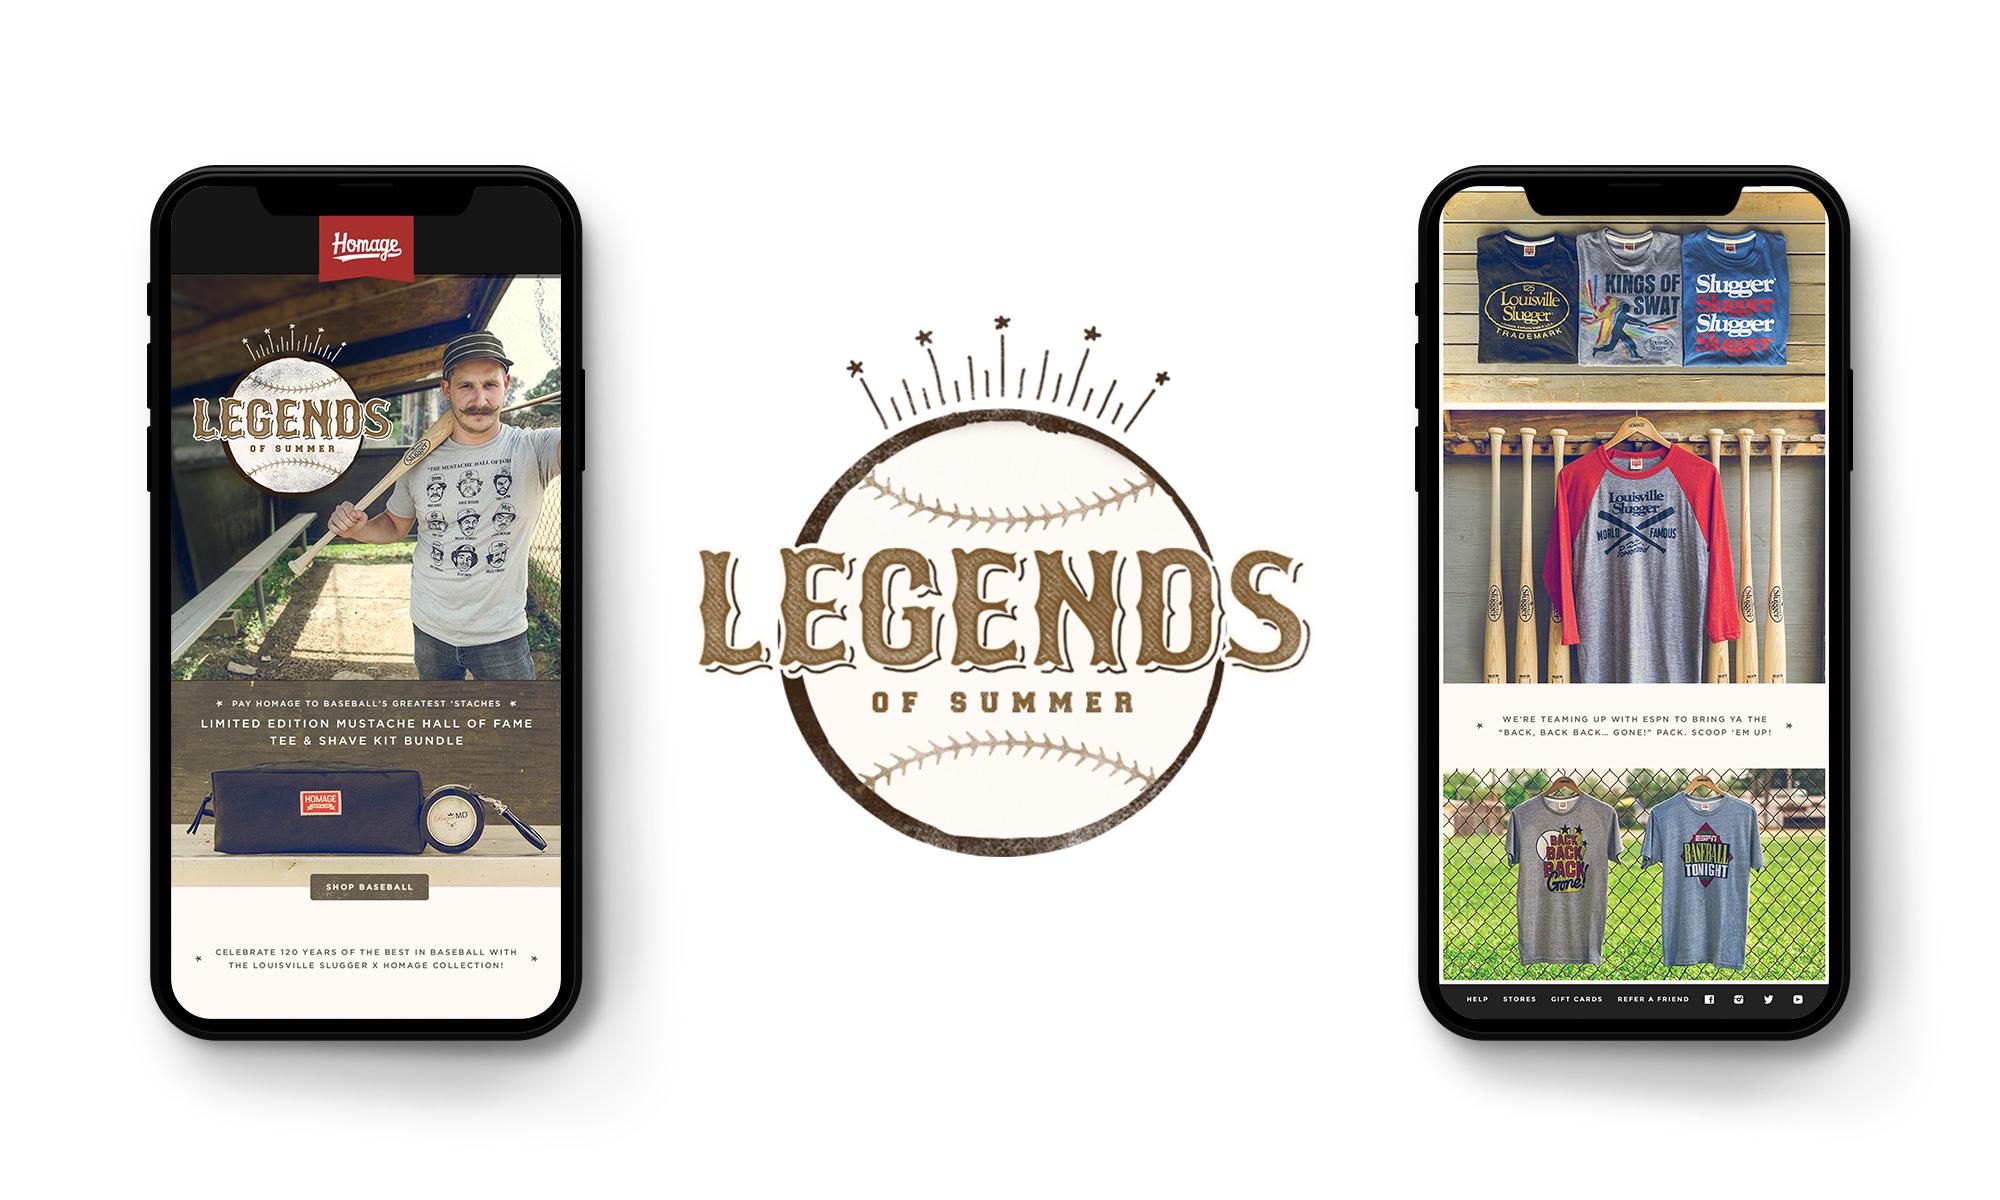 homage-baseball-legends-of-summer-email.jpg